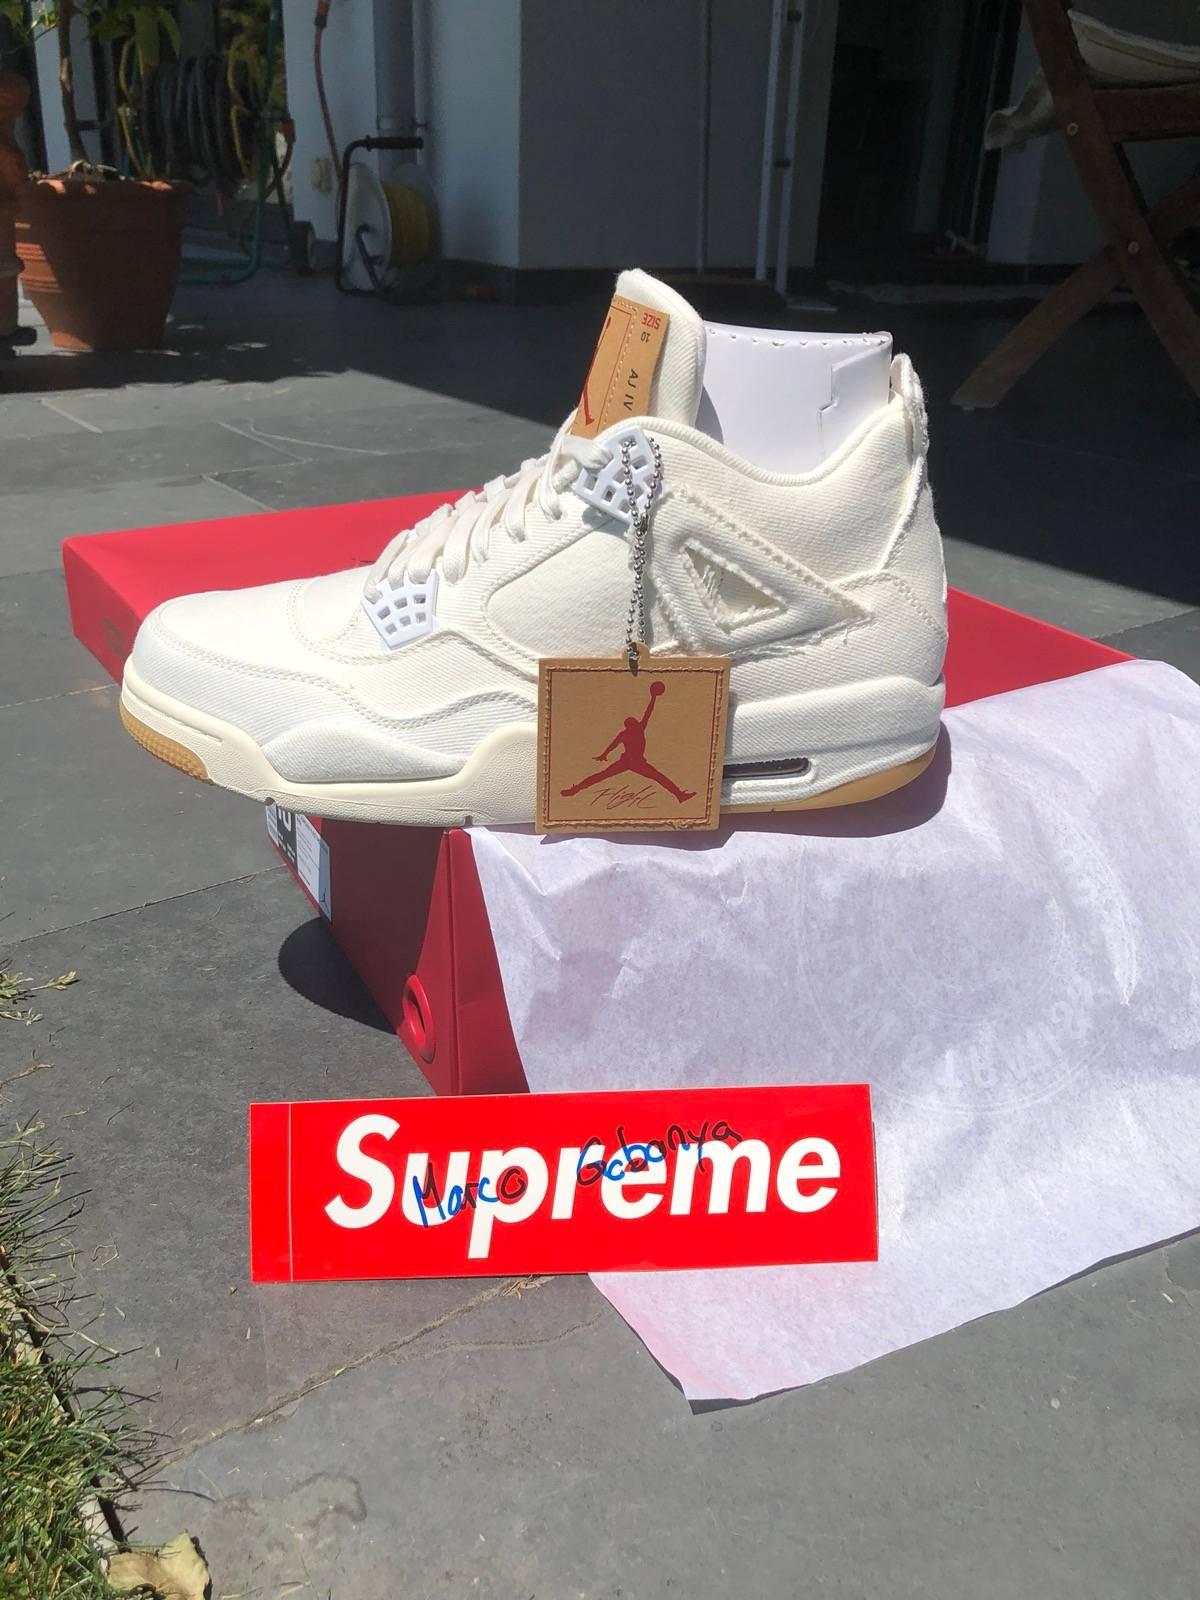 sale retailer c3ad0 4f477 Jordan Brand × Levi's Air Jordan 4 X Levi'S White Denim Size 10 $400